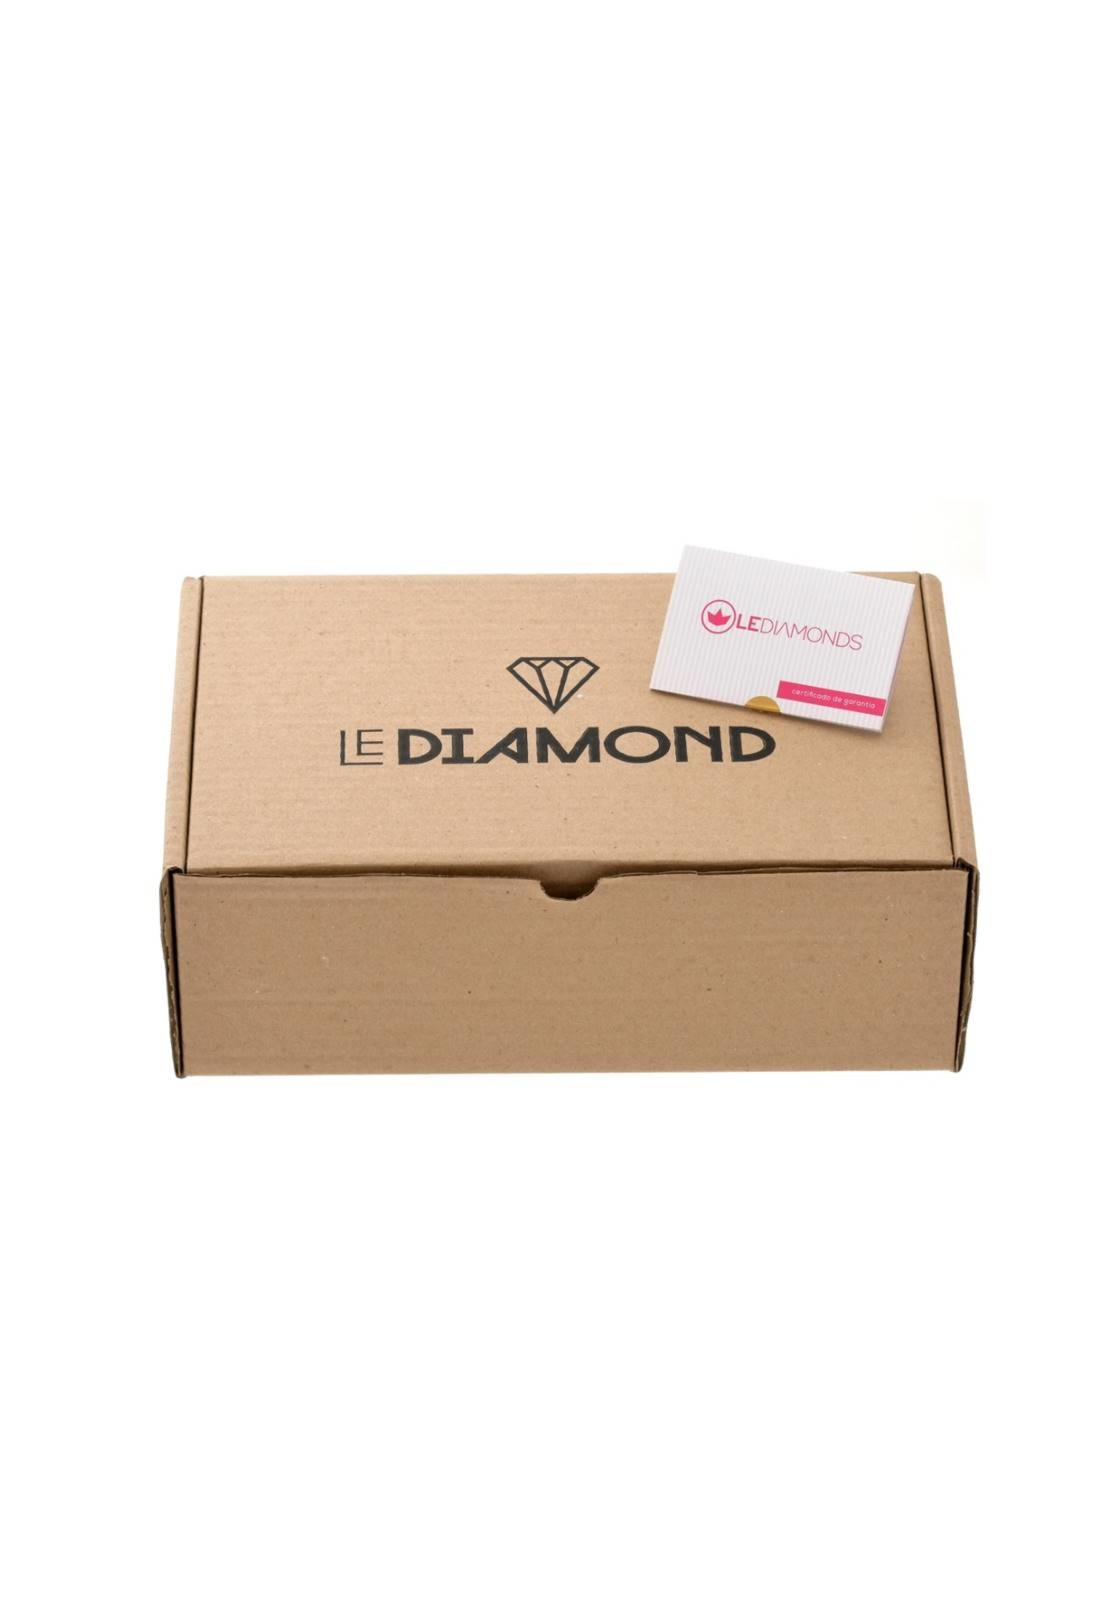 Brinco Le Diamond Janina Longo Marmorizado